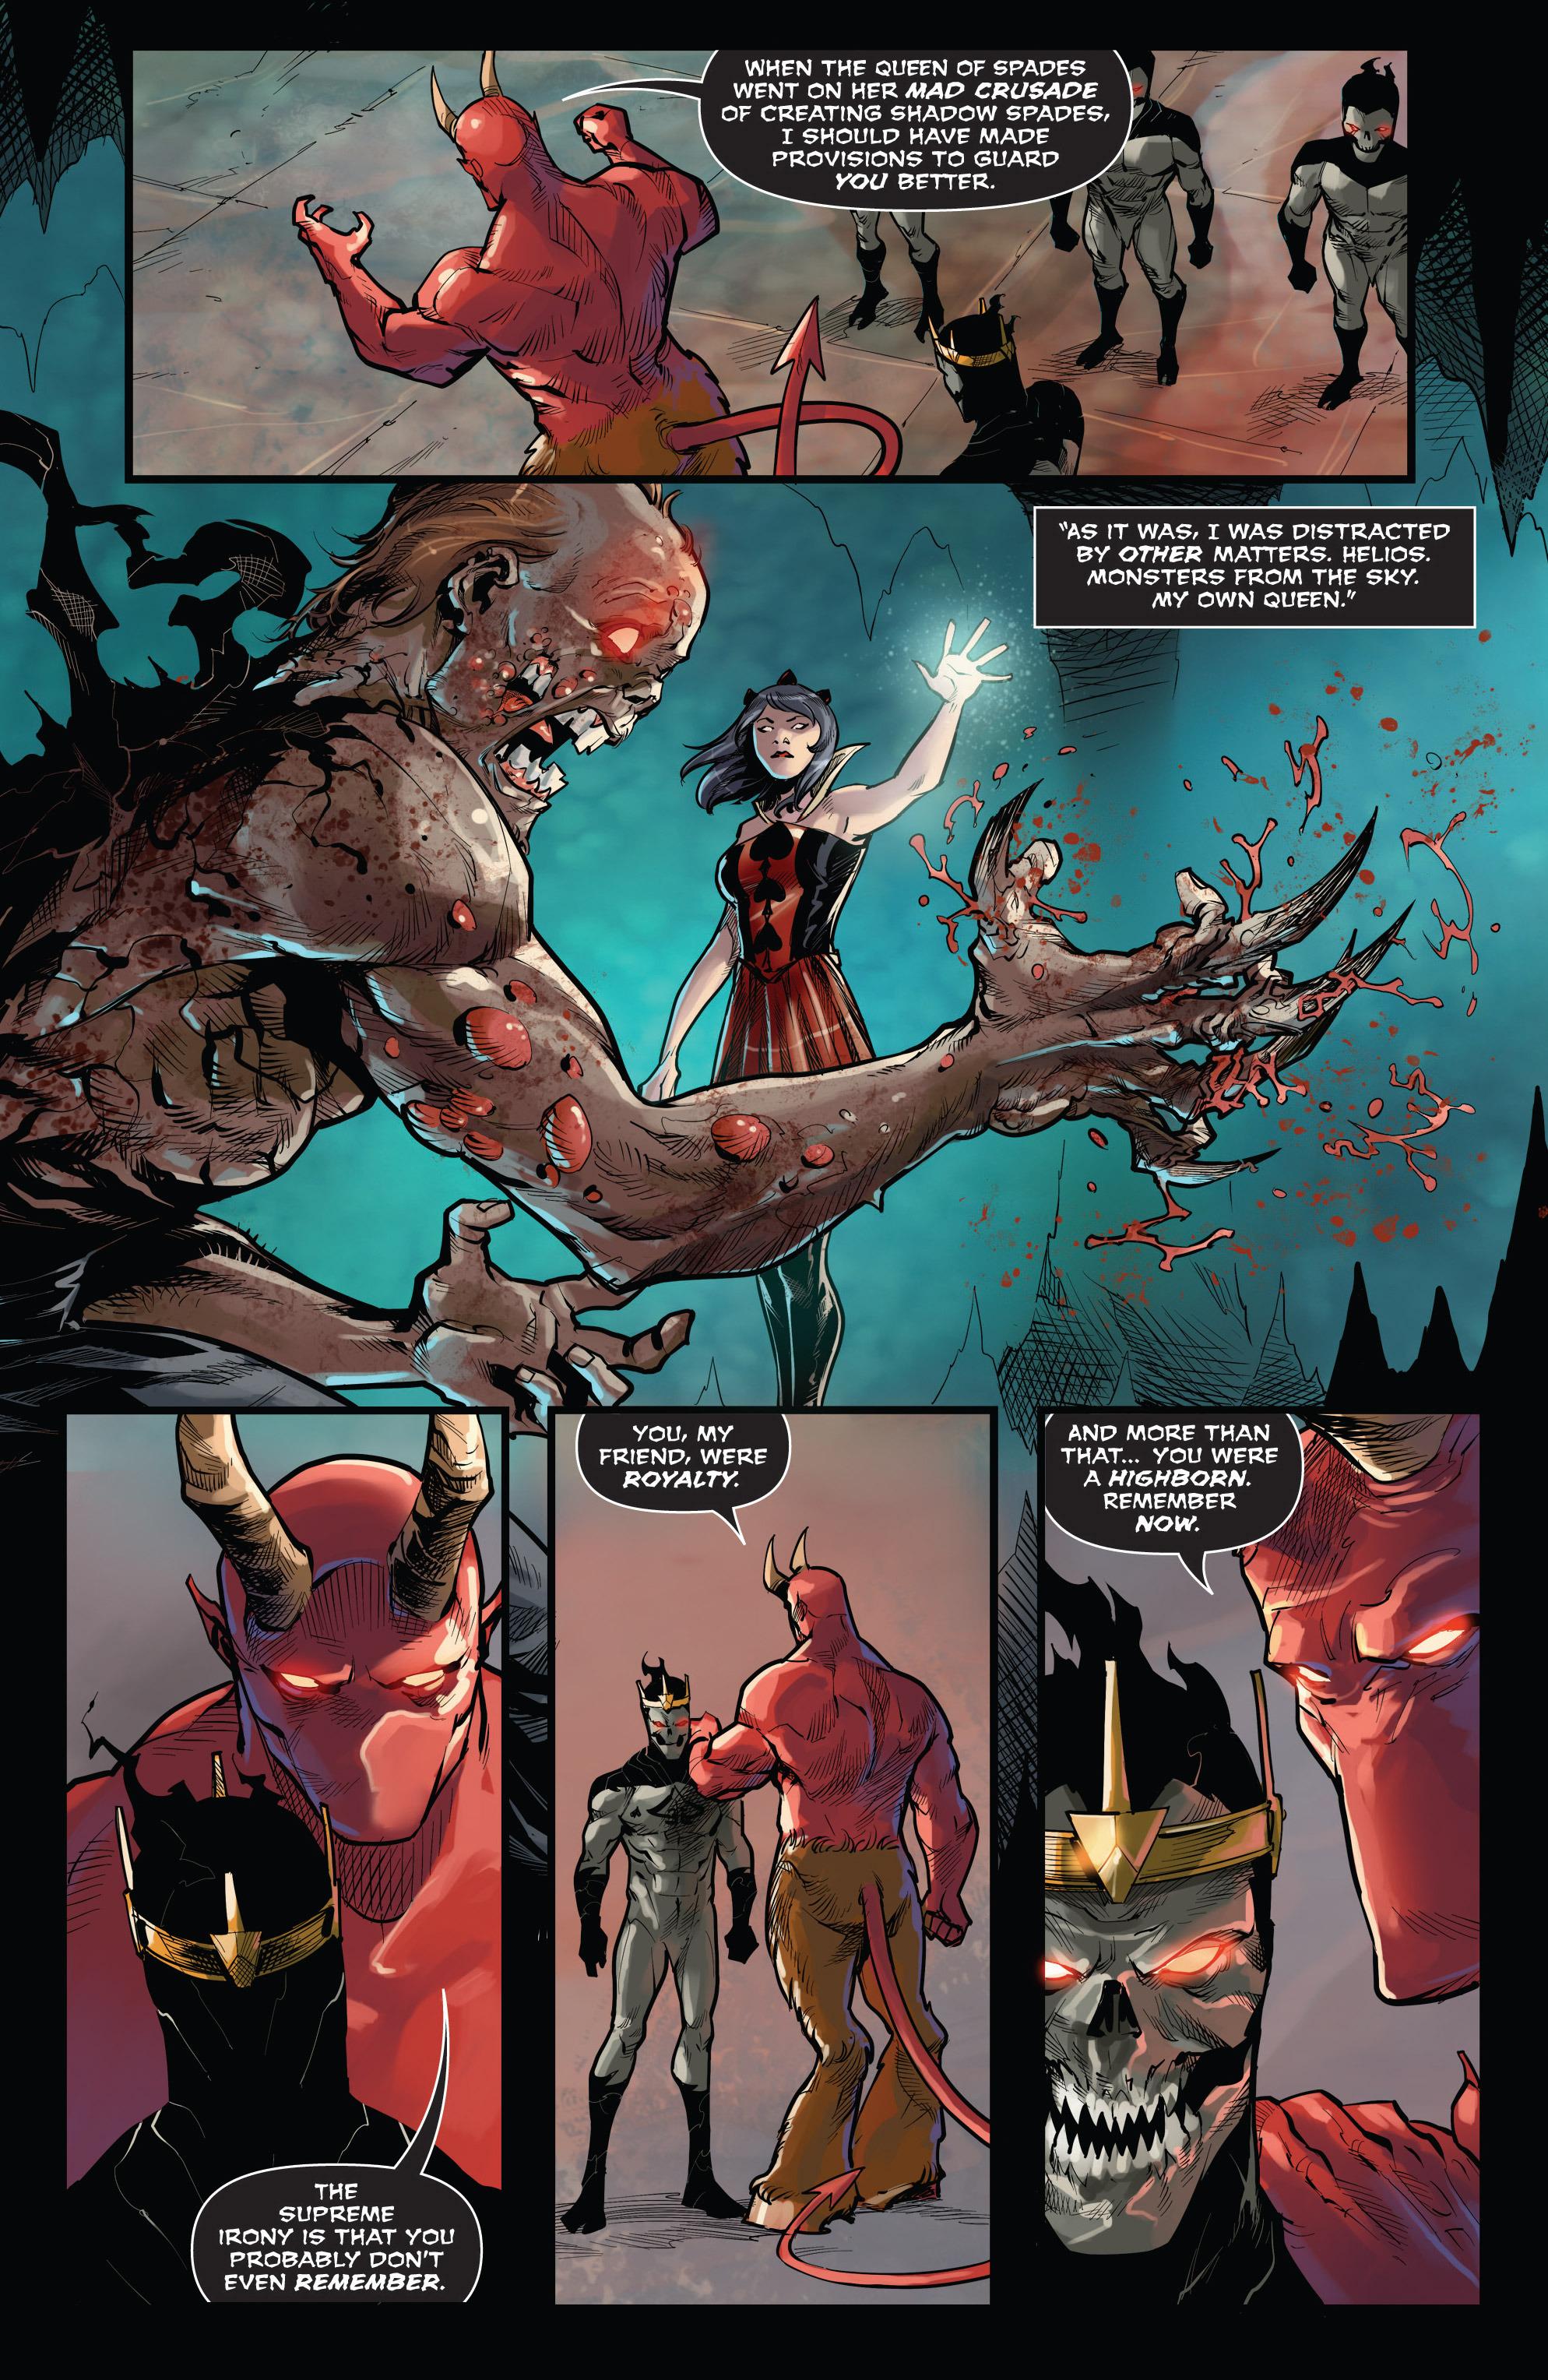 Read online Grimm Fairy Tales vs. Wonderland comic -  Issue #3 - 10